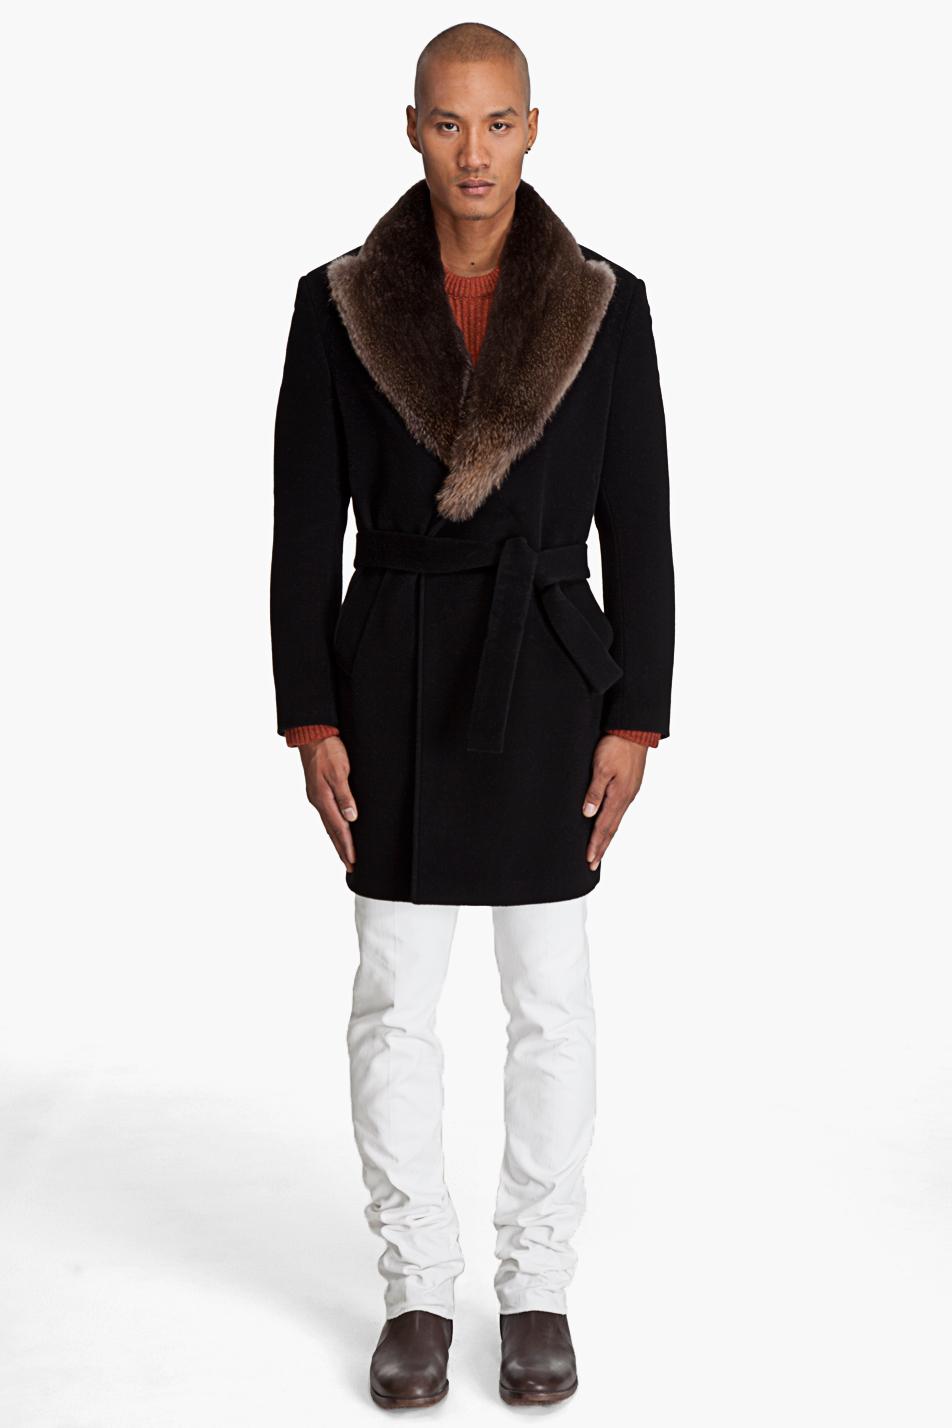 Maison Margiela Fur Collar Coat In Black For Men Lyst